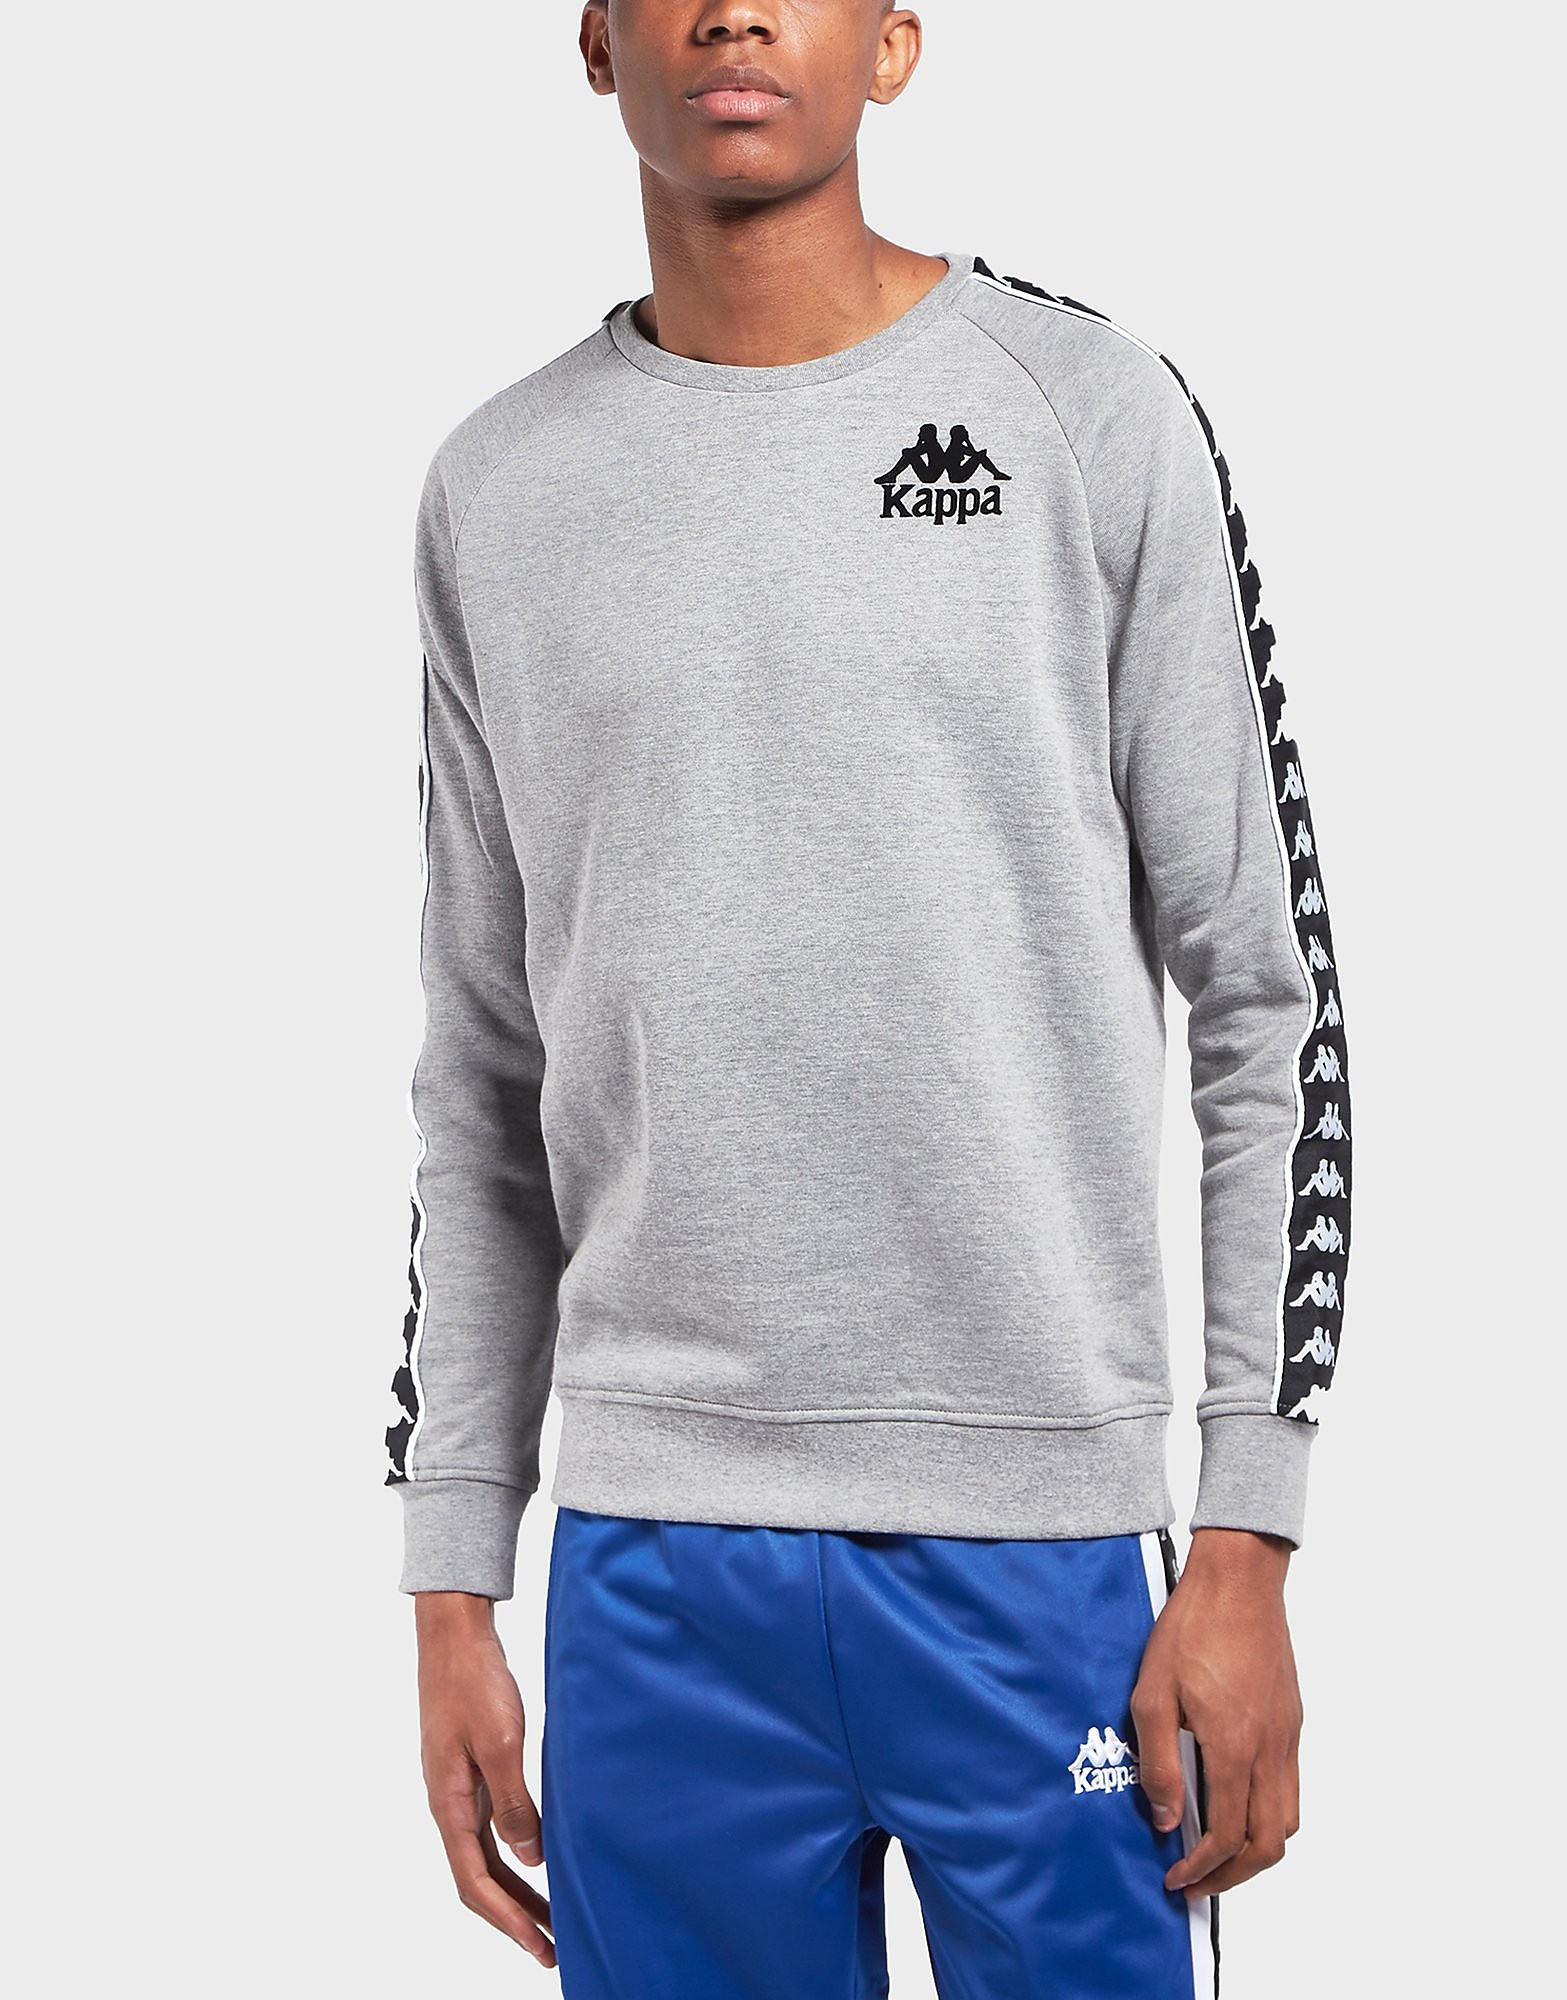 Kappa Hassan Crew Sweatshirt